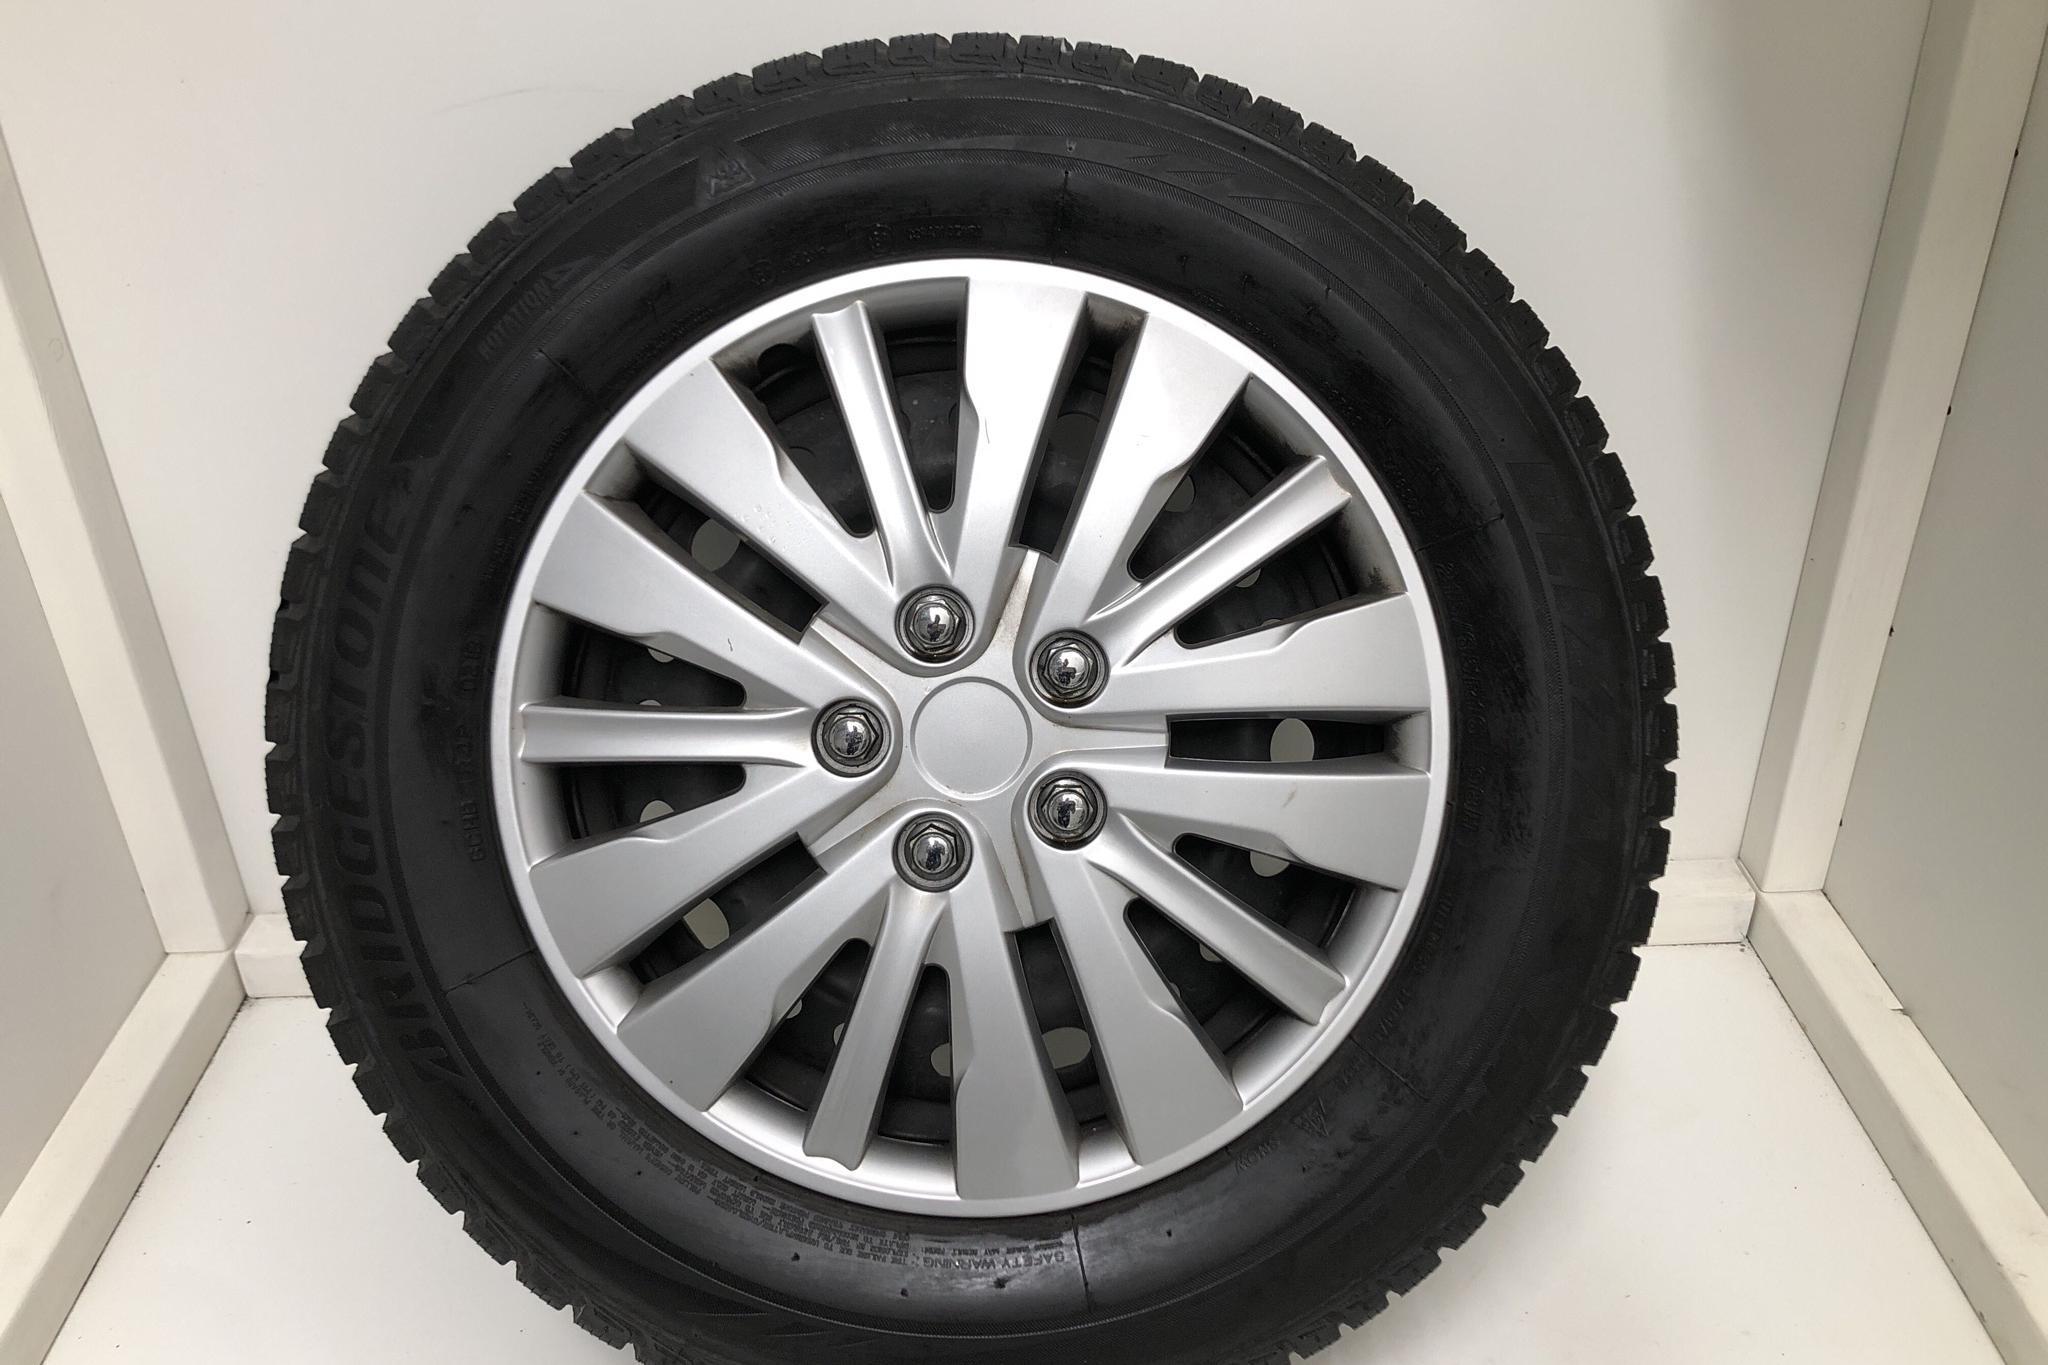 Nissan Qashqai 1.2 DIG-T (115hk) - 56 750 km - Manual - gray - 2018